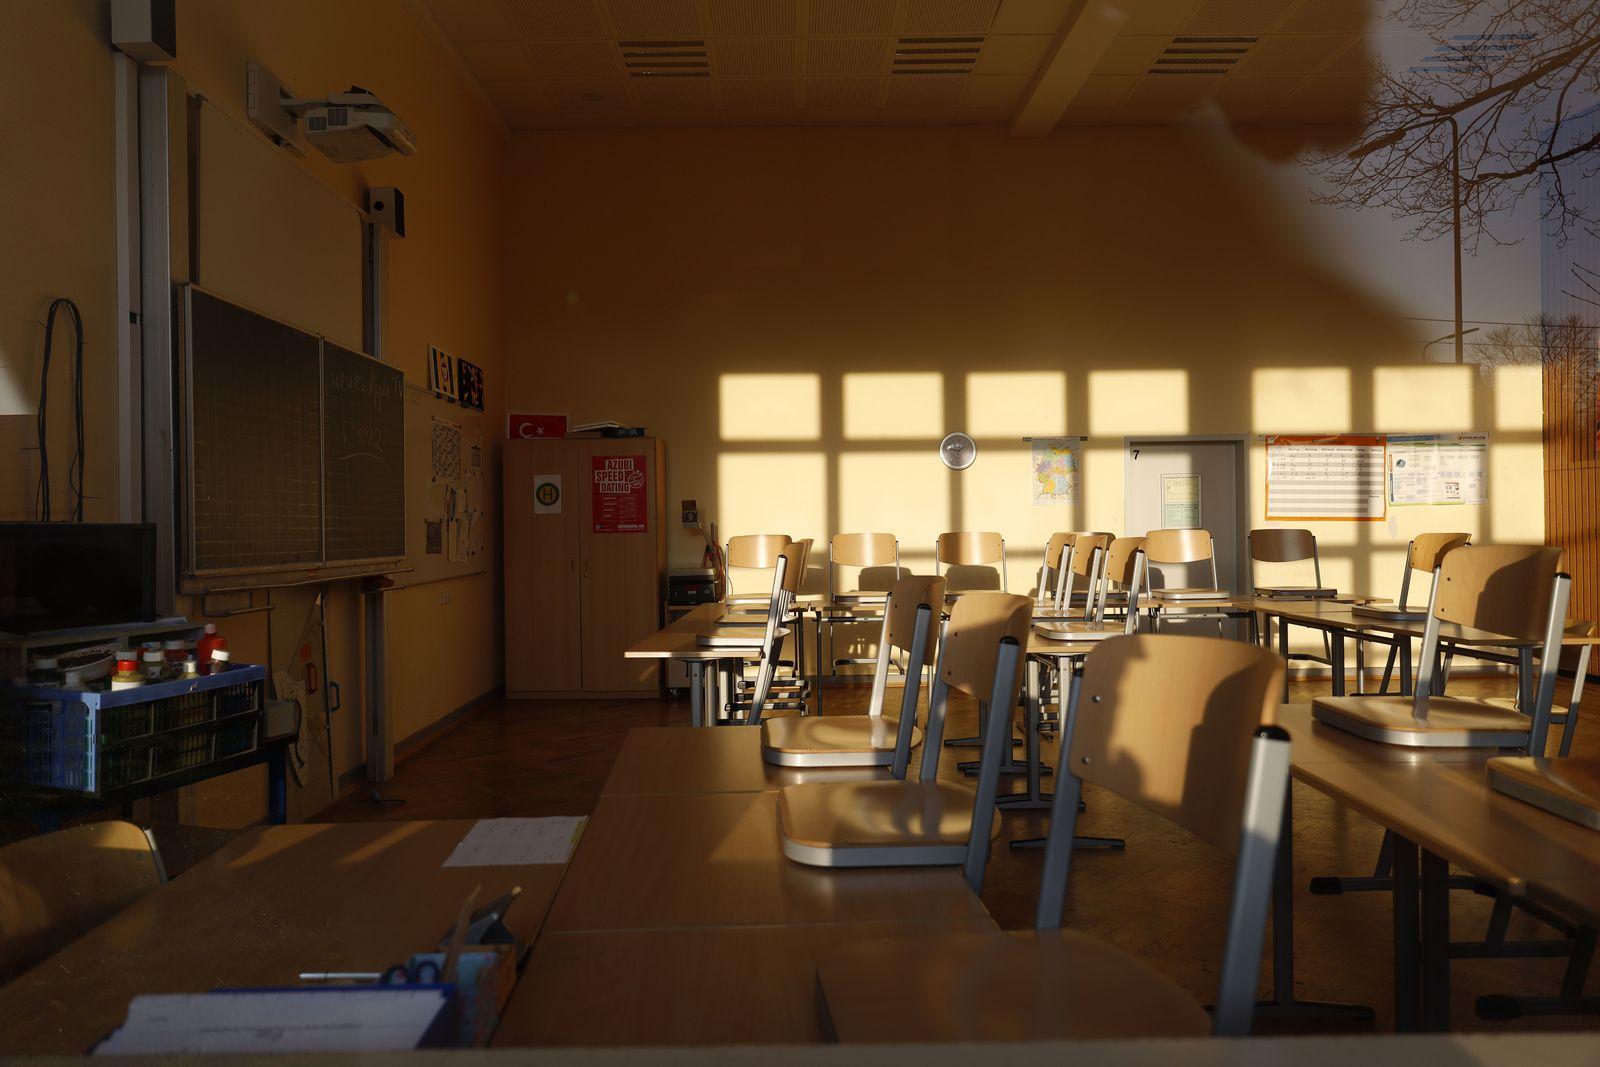 Gesperrte Schule